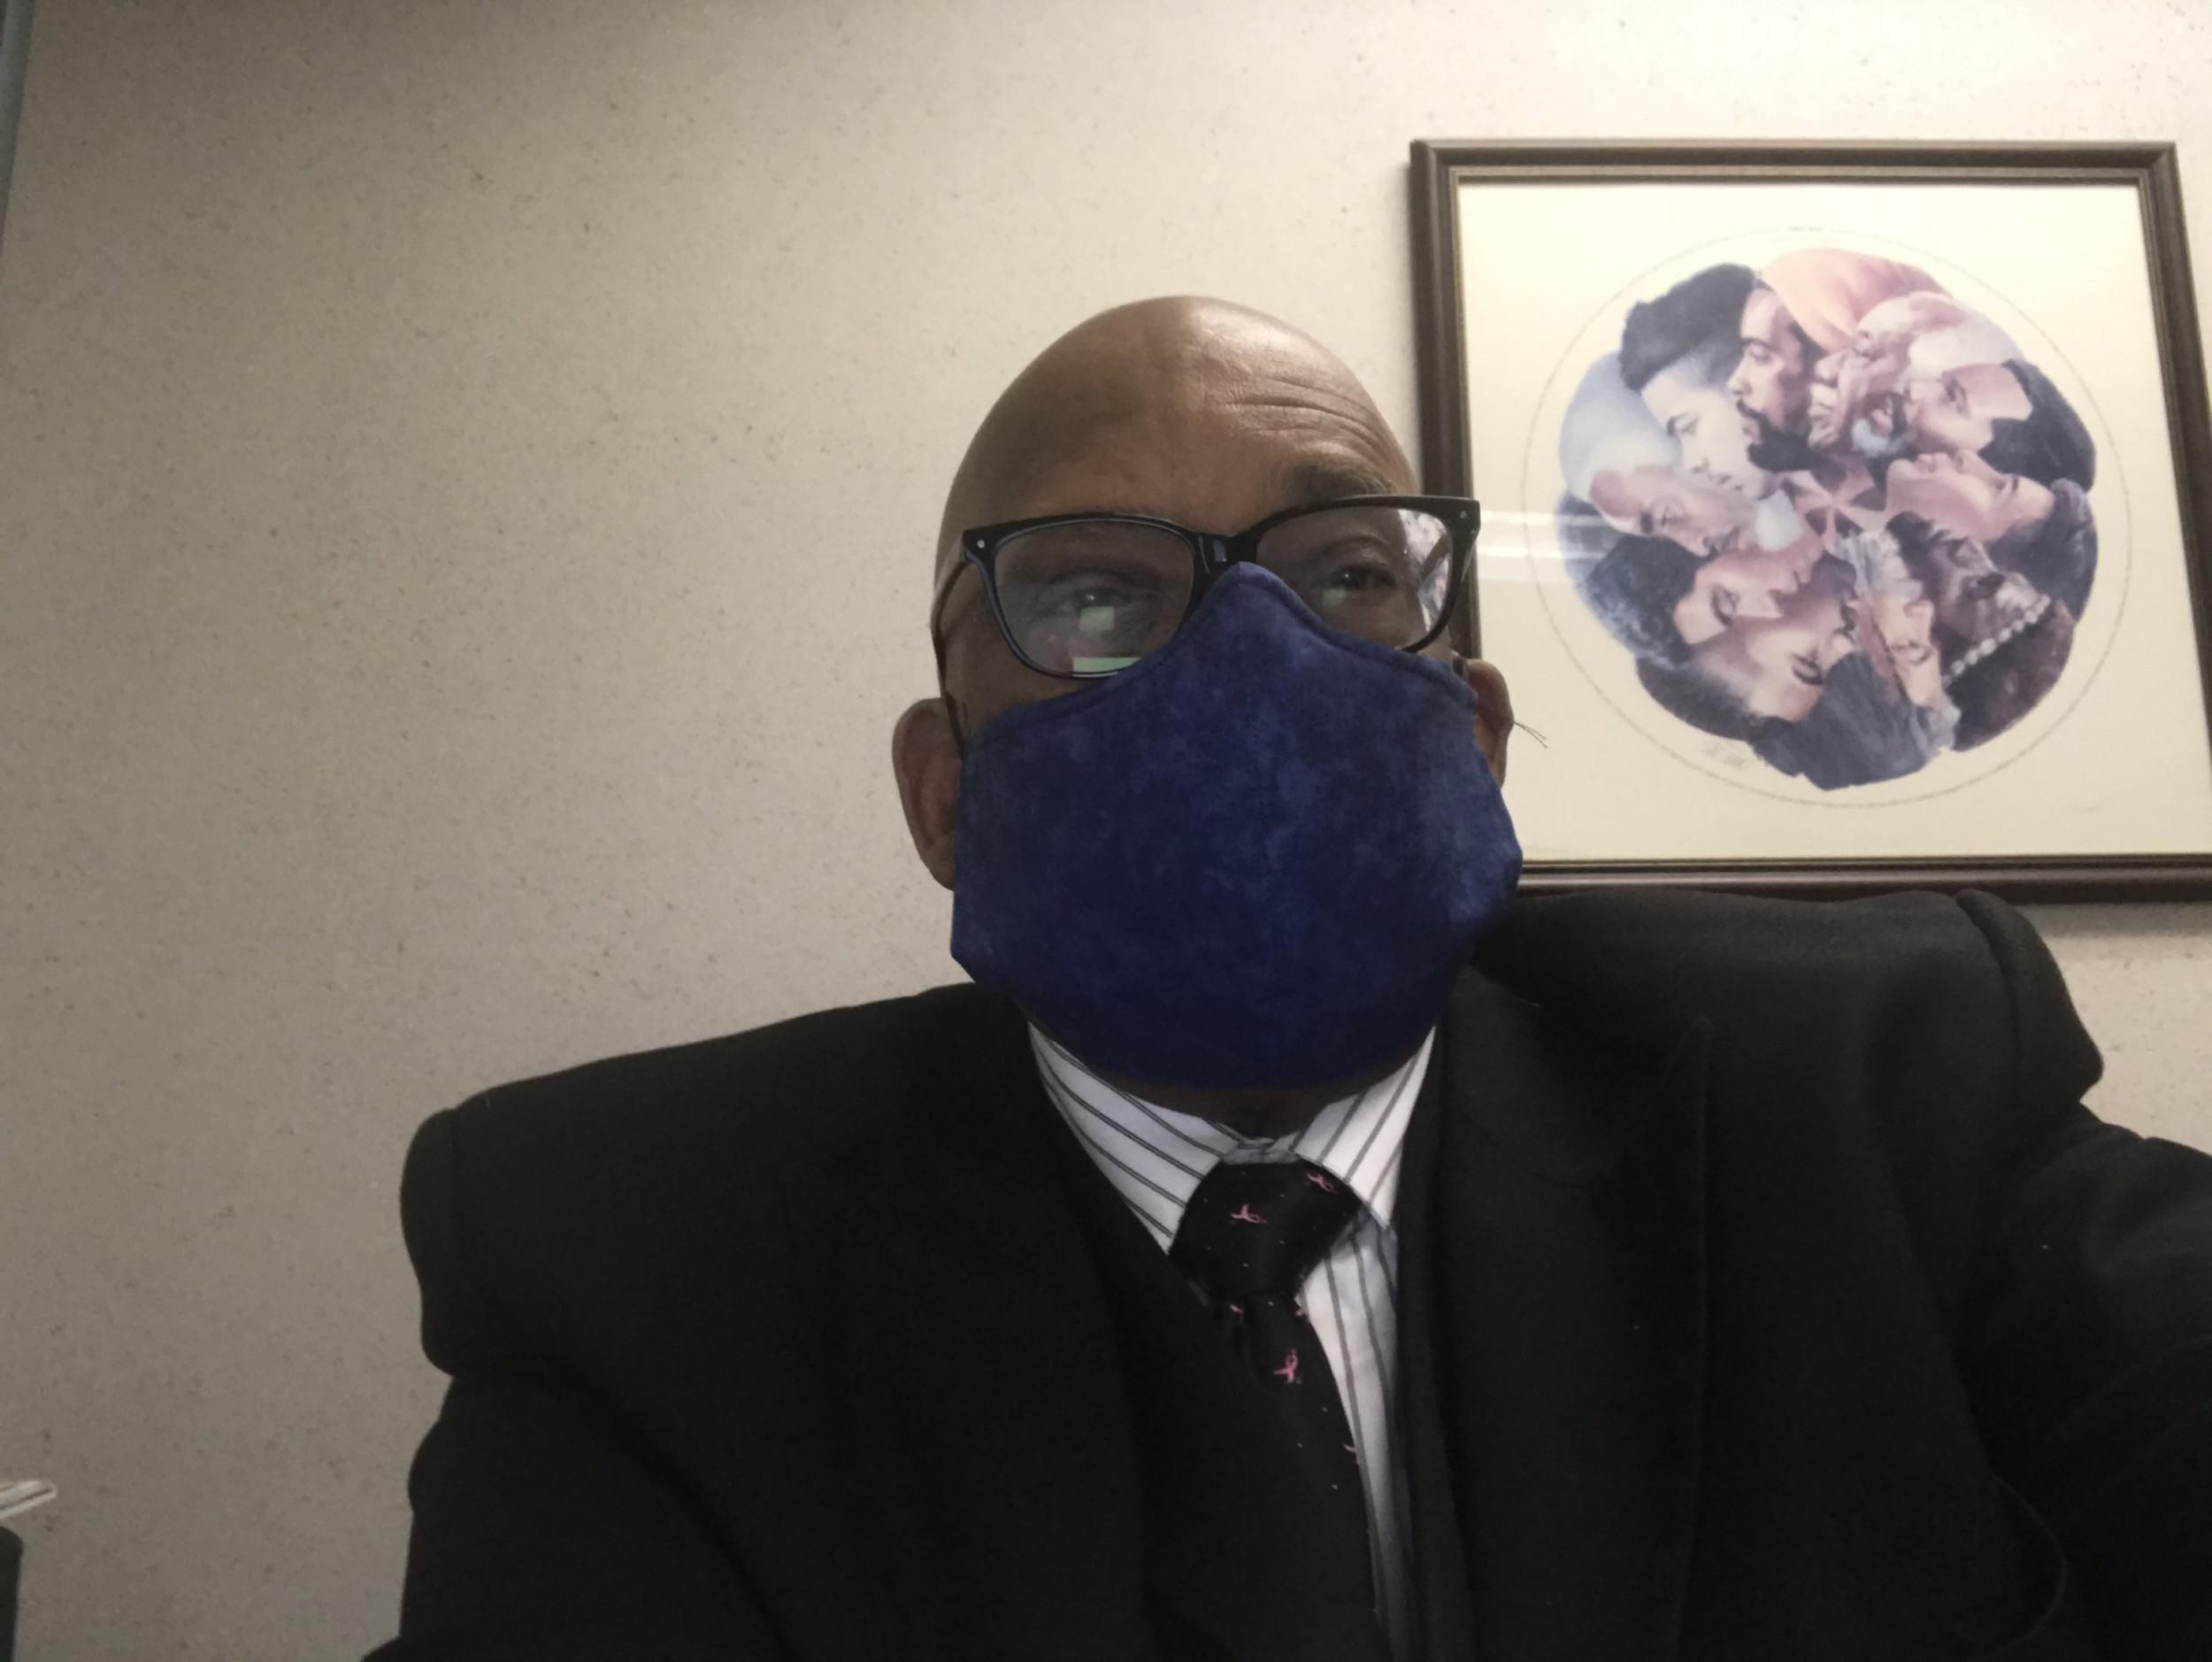 Funeral Home, Coronavirus, Funeral Director, Michigan